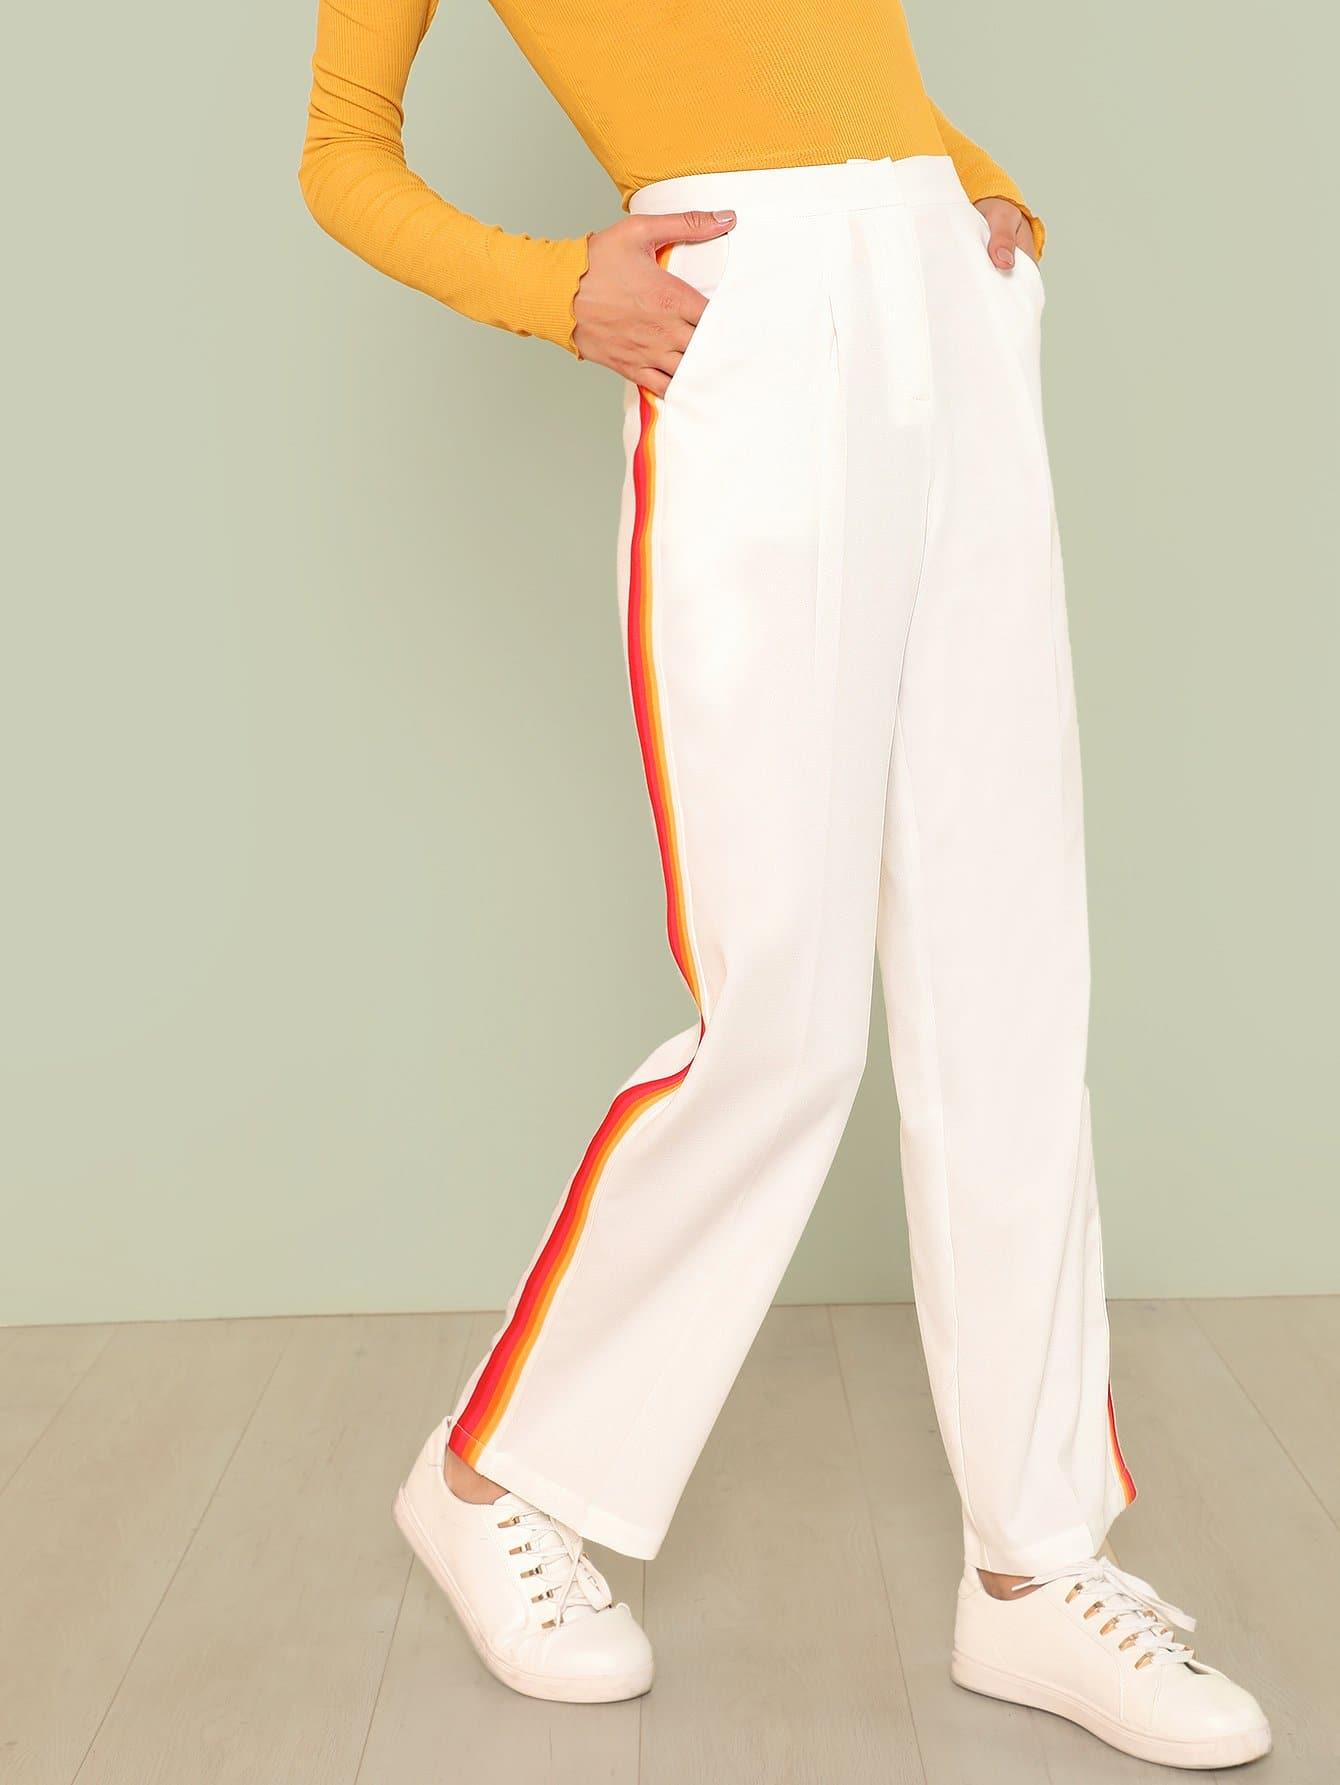 Slant Pocket Striped Tape Side Pants striped tape side cuffed pants